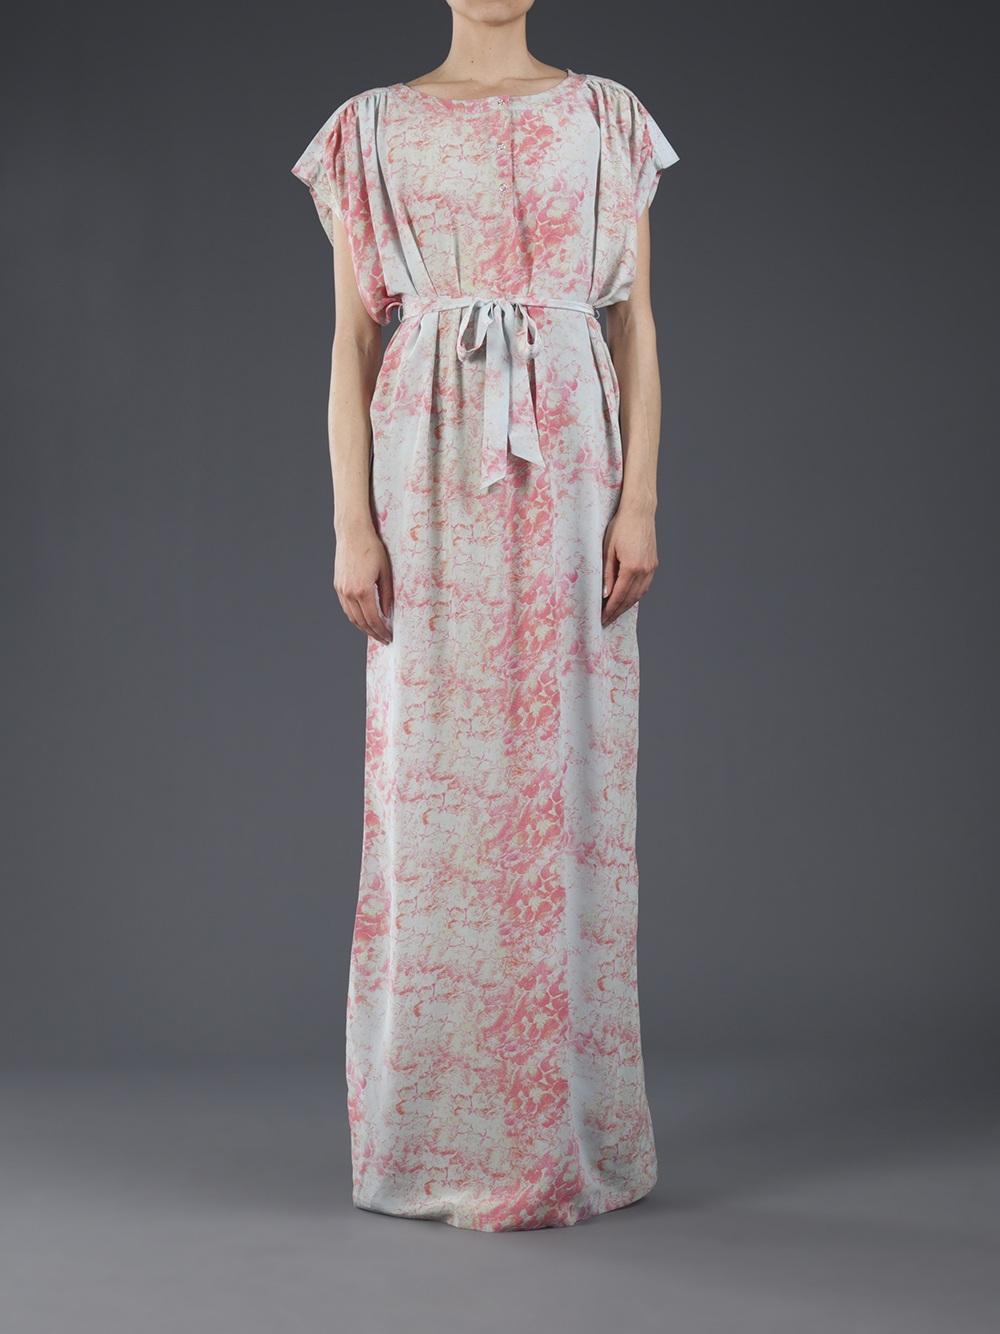 Tunic maxi dresses